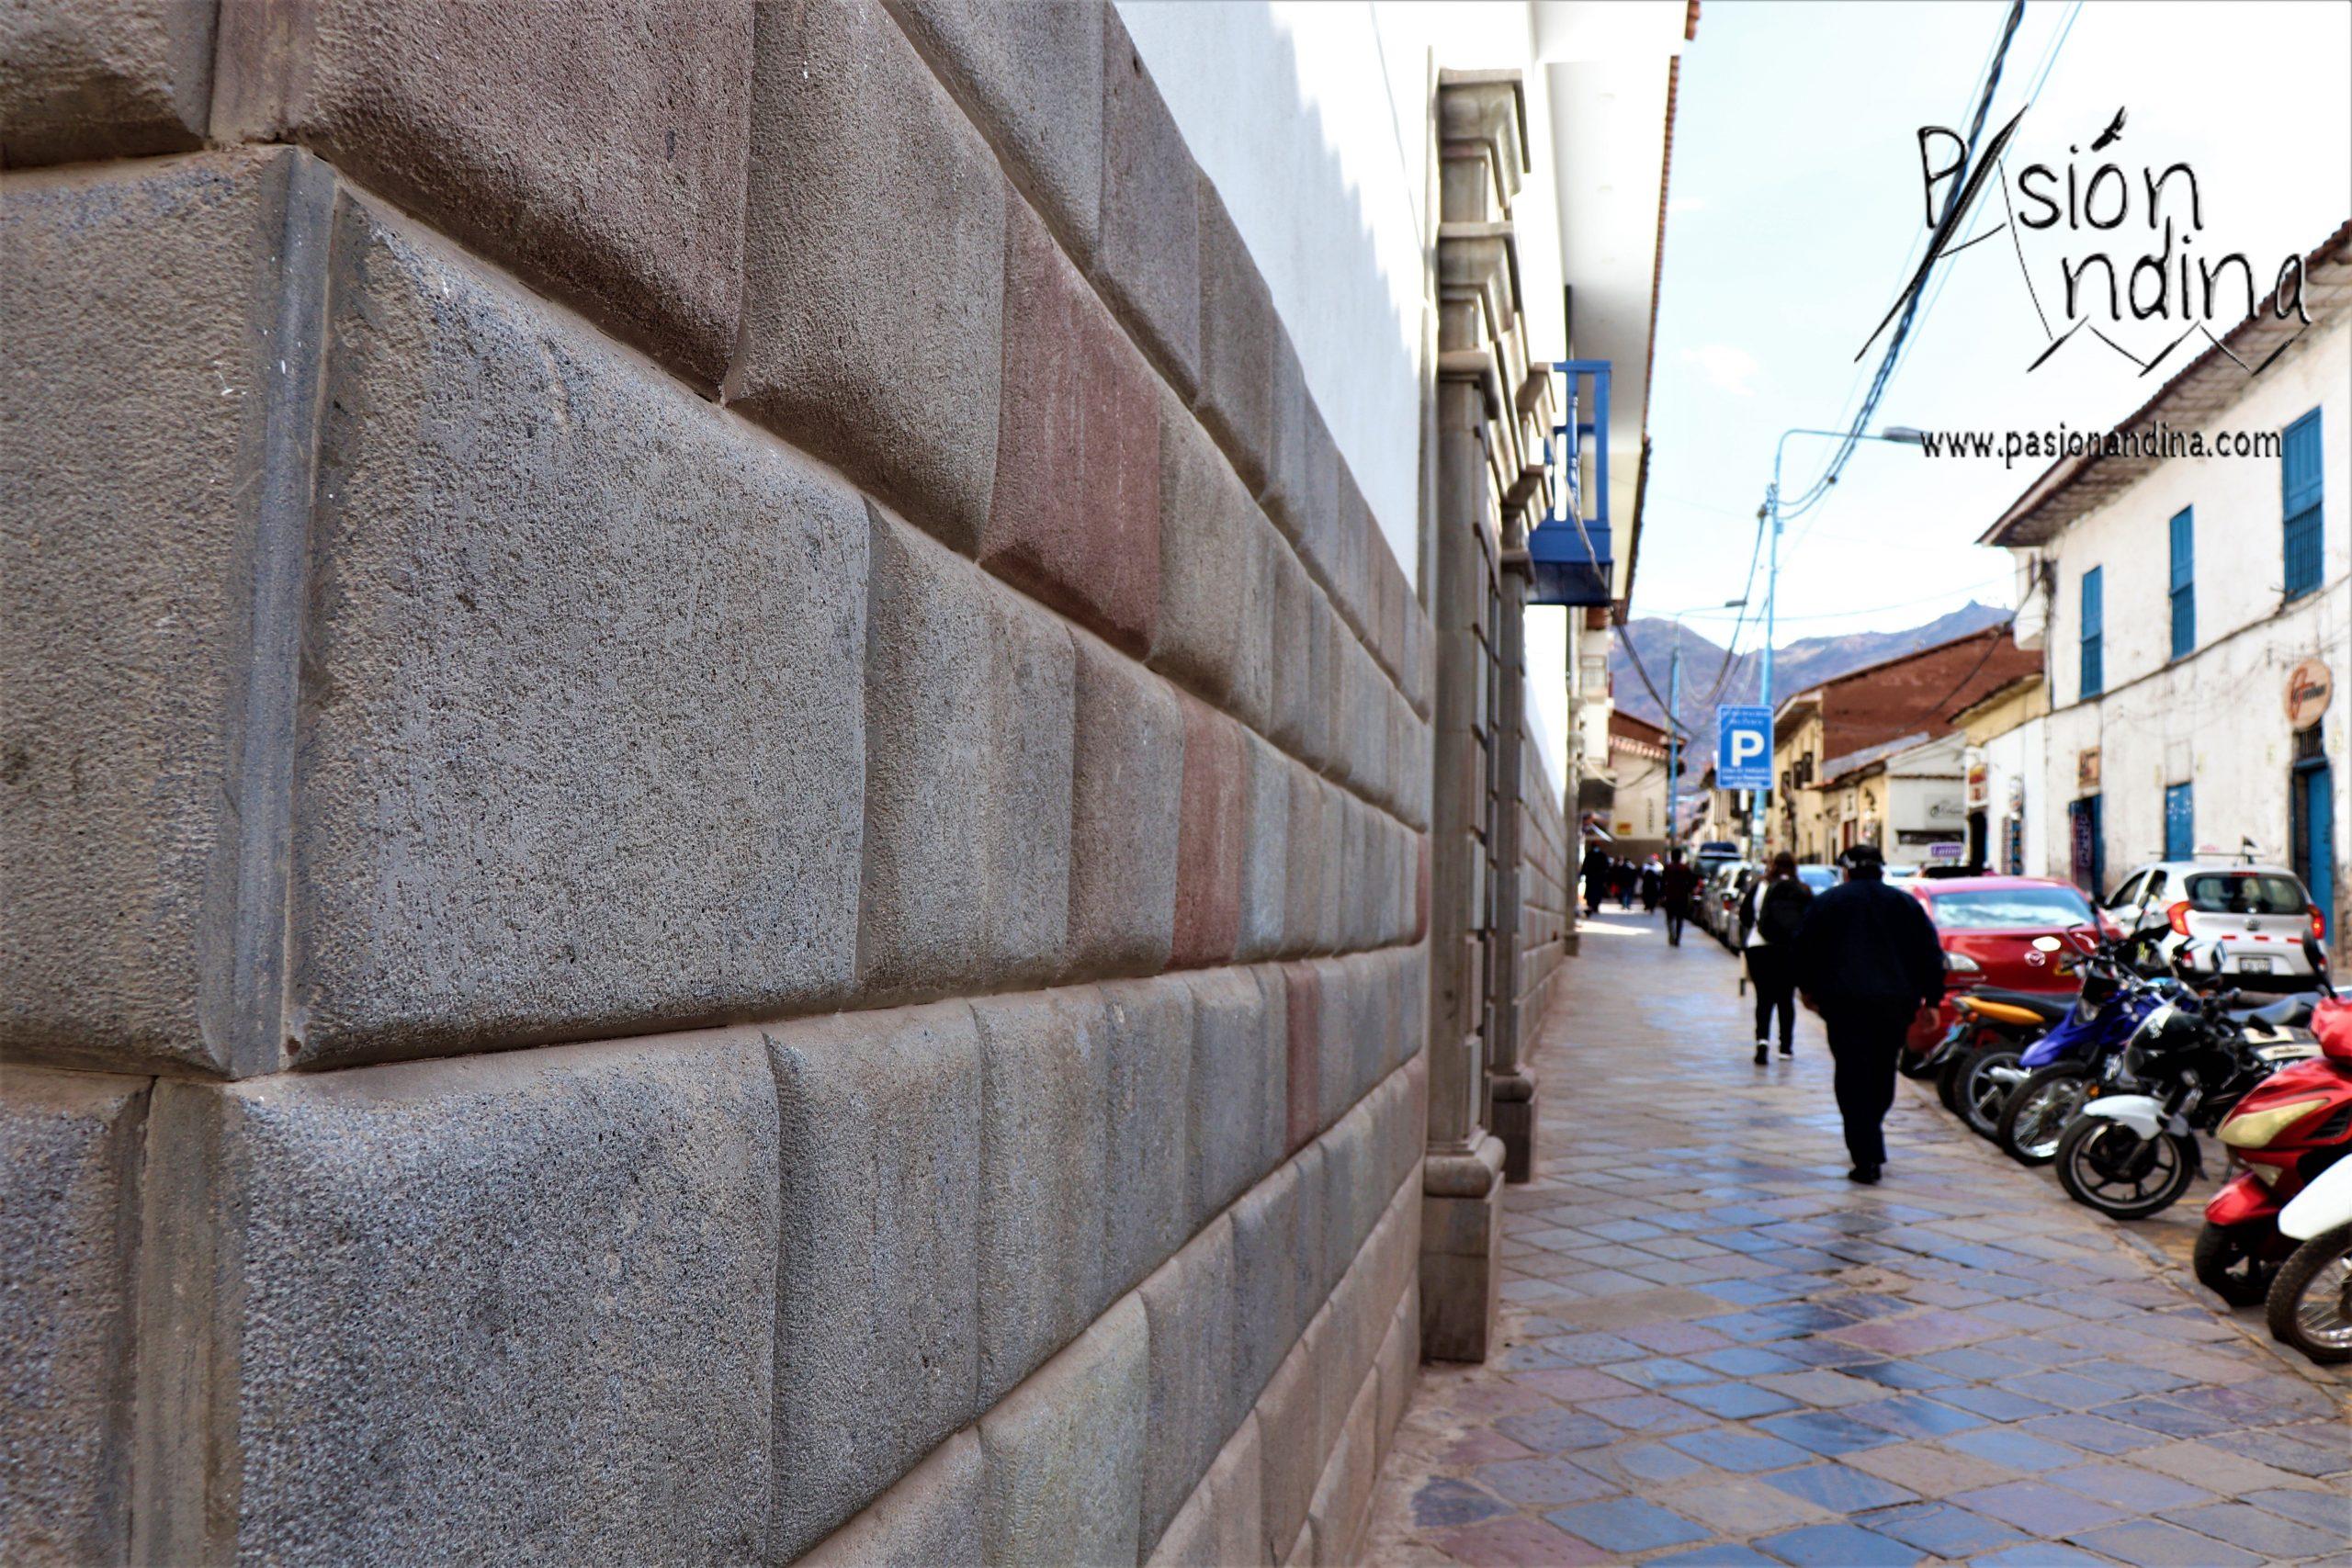 Calle Q'era - Cusco - Peru - Pasion Andina